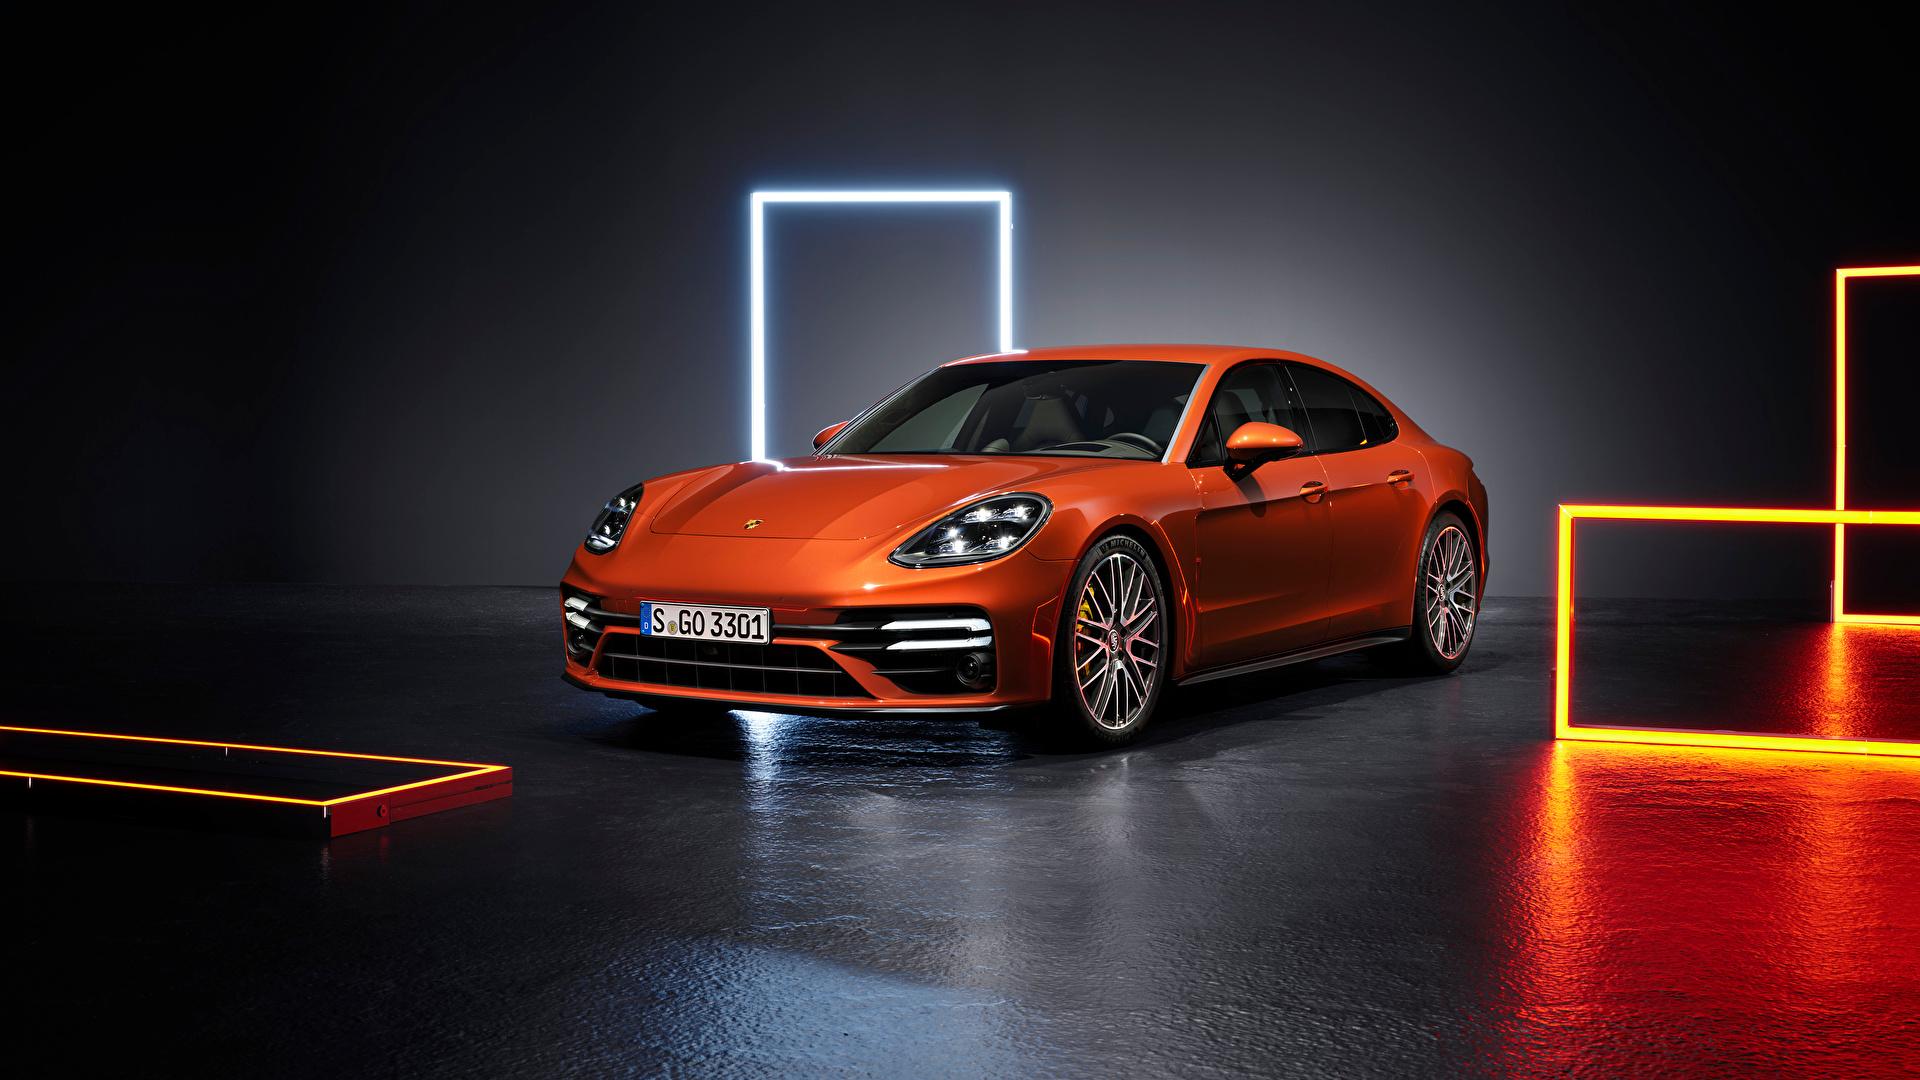 Фото Порше Panamera Turbo S (971), 2020 оранжевые машина Металлик 1920x1080 Porsche оранжевая Оранжевый оранжевых авто машины Автомобили автомобиль